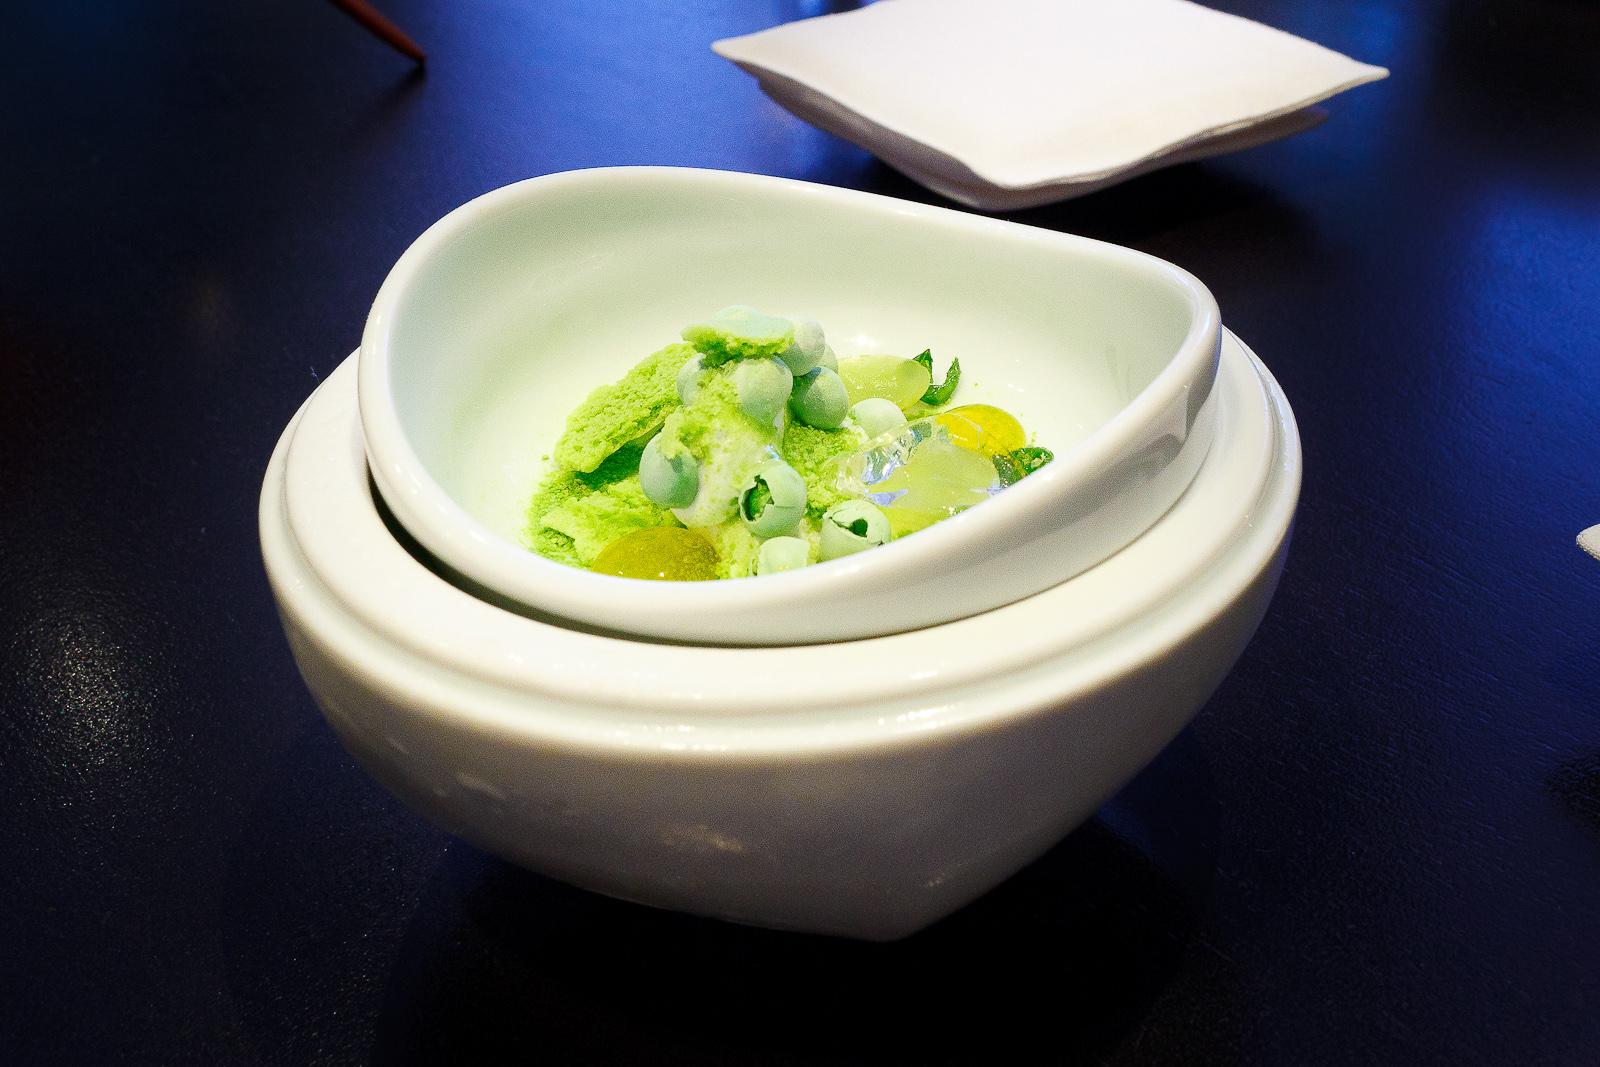 Part II - English pea, olive oil, chamomile, green apple